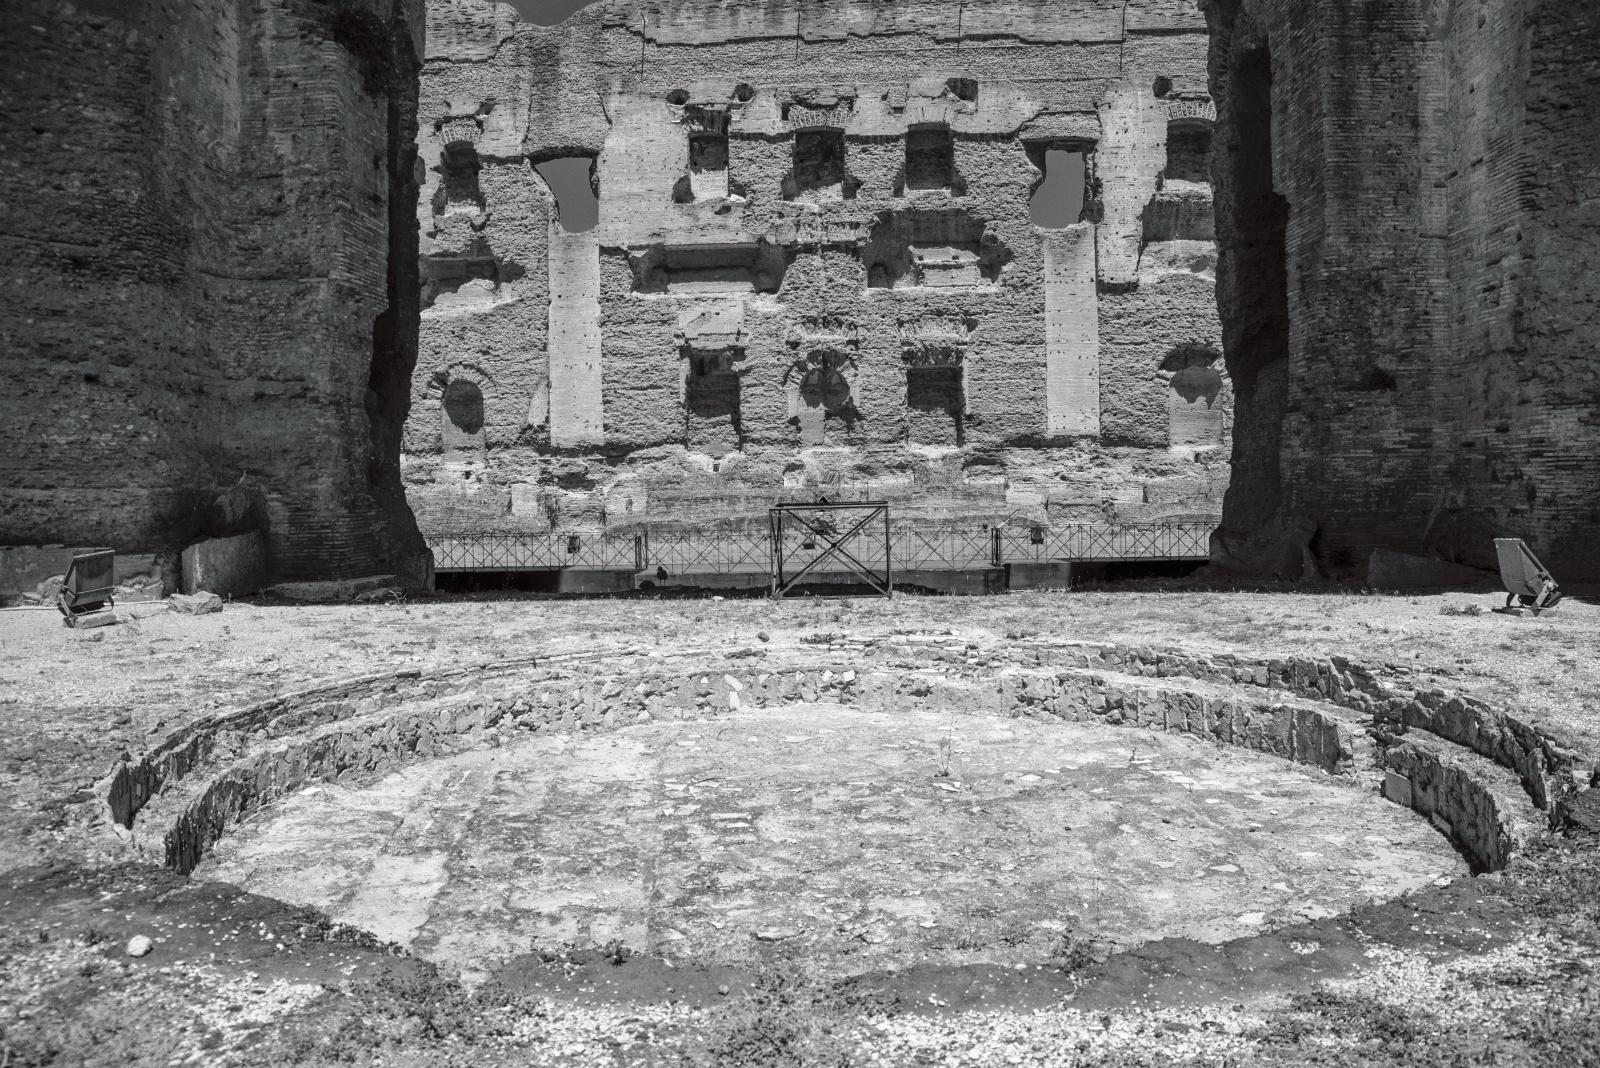 Annalisa Melas - Terme di Caracalla - 2